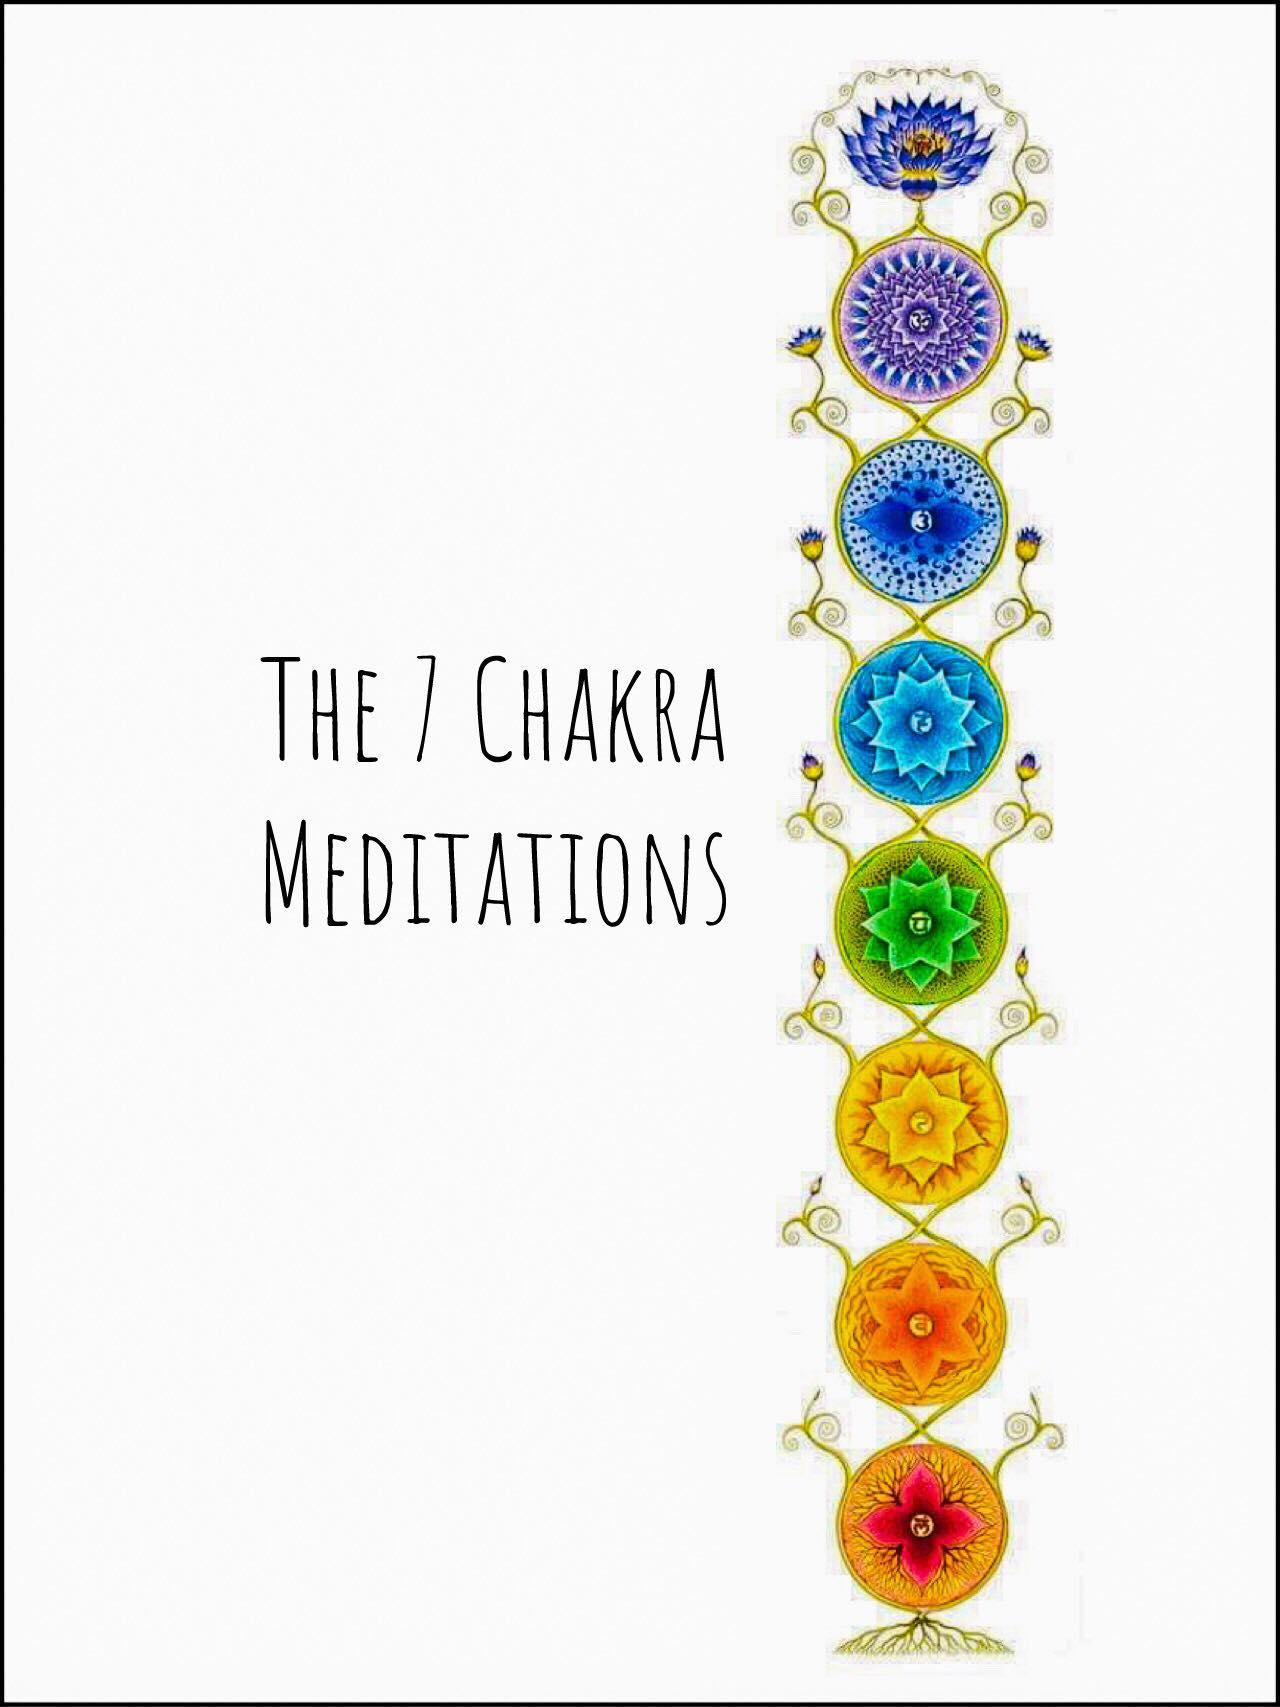 7 Chakra Meditations